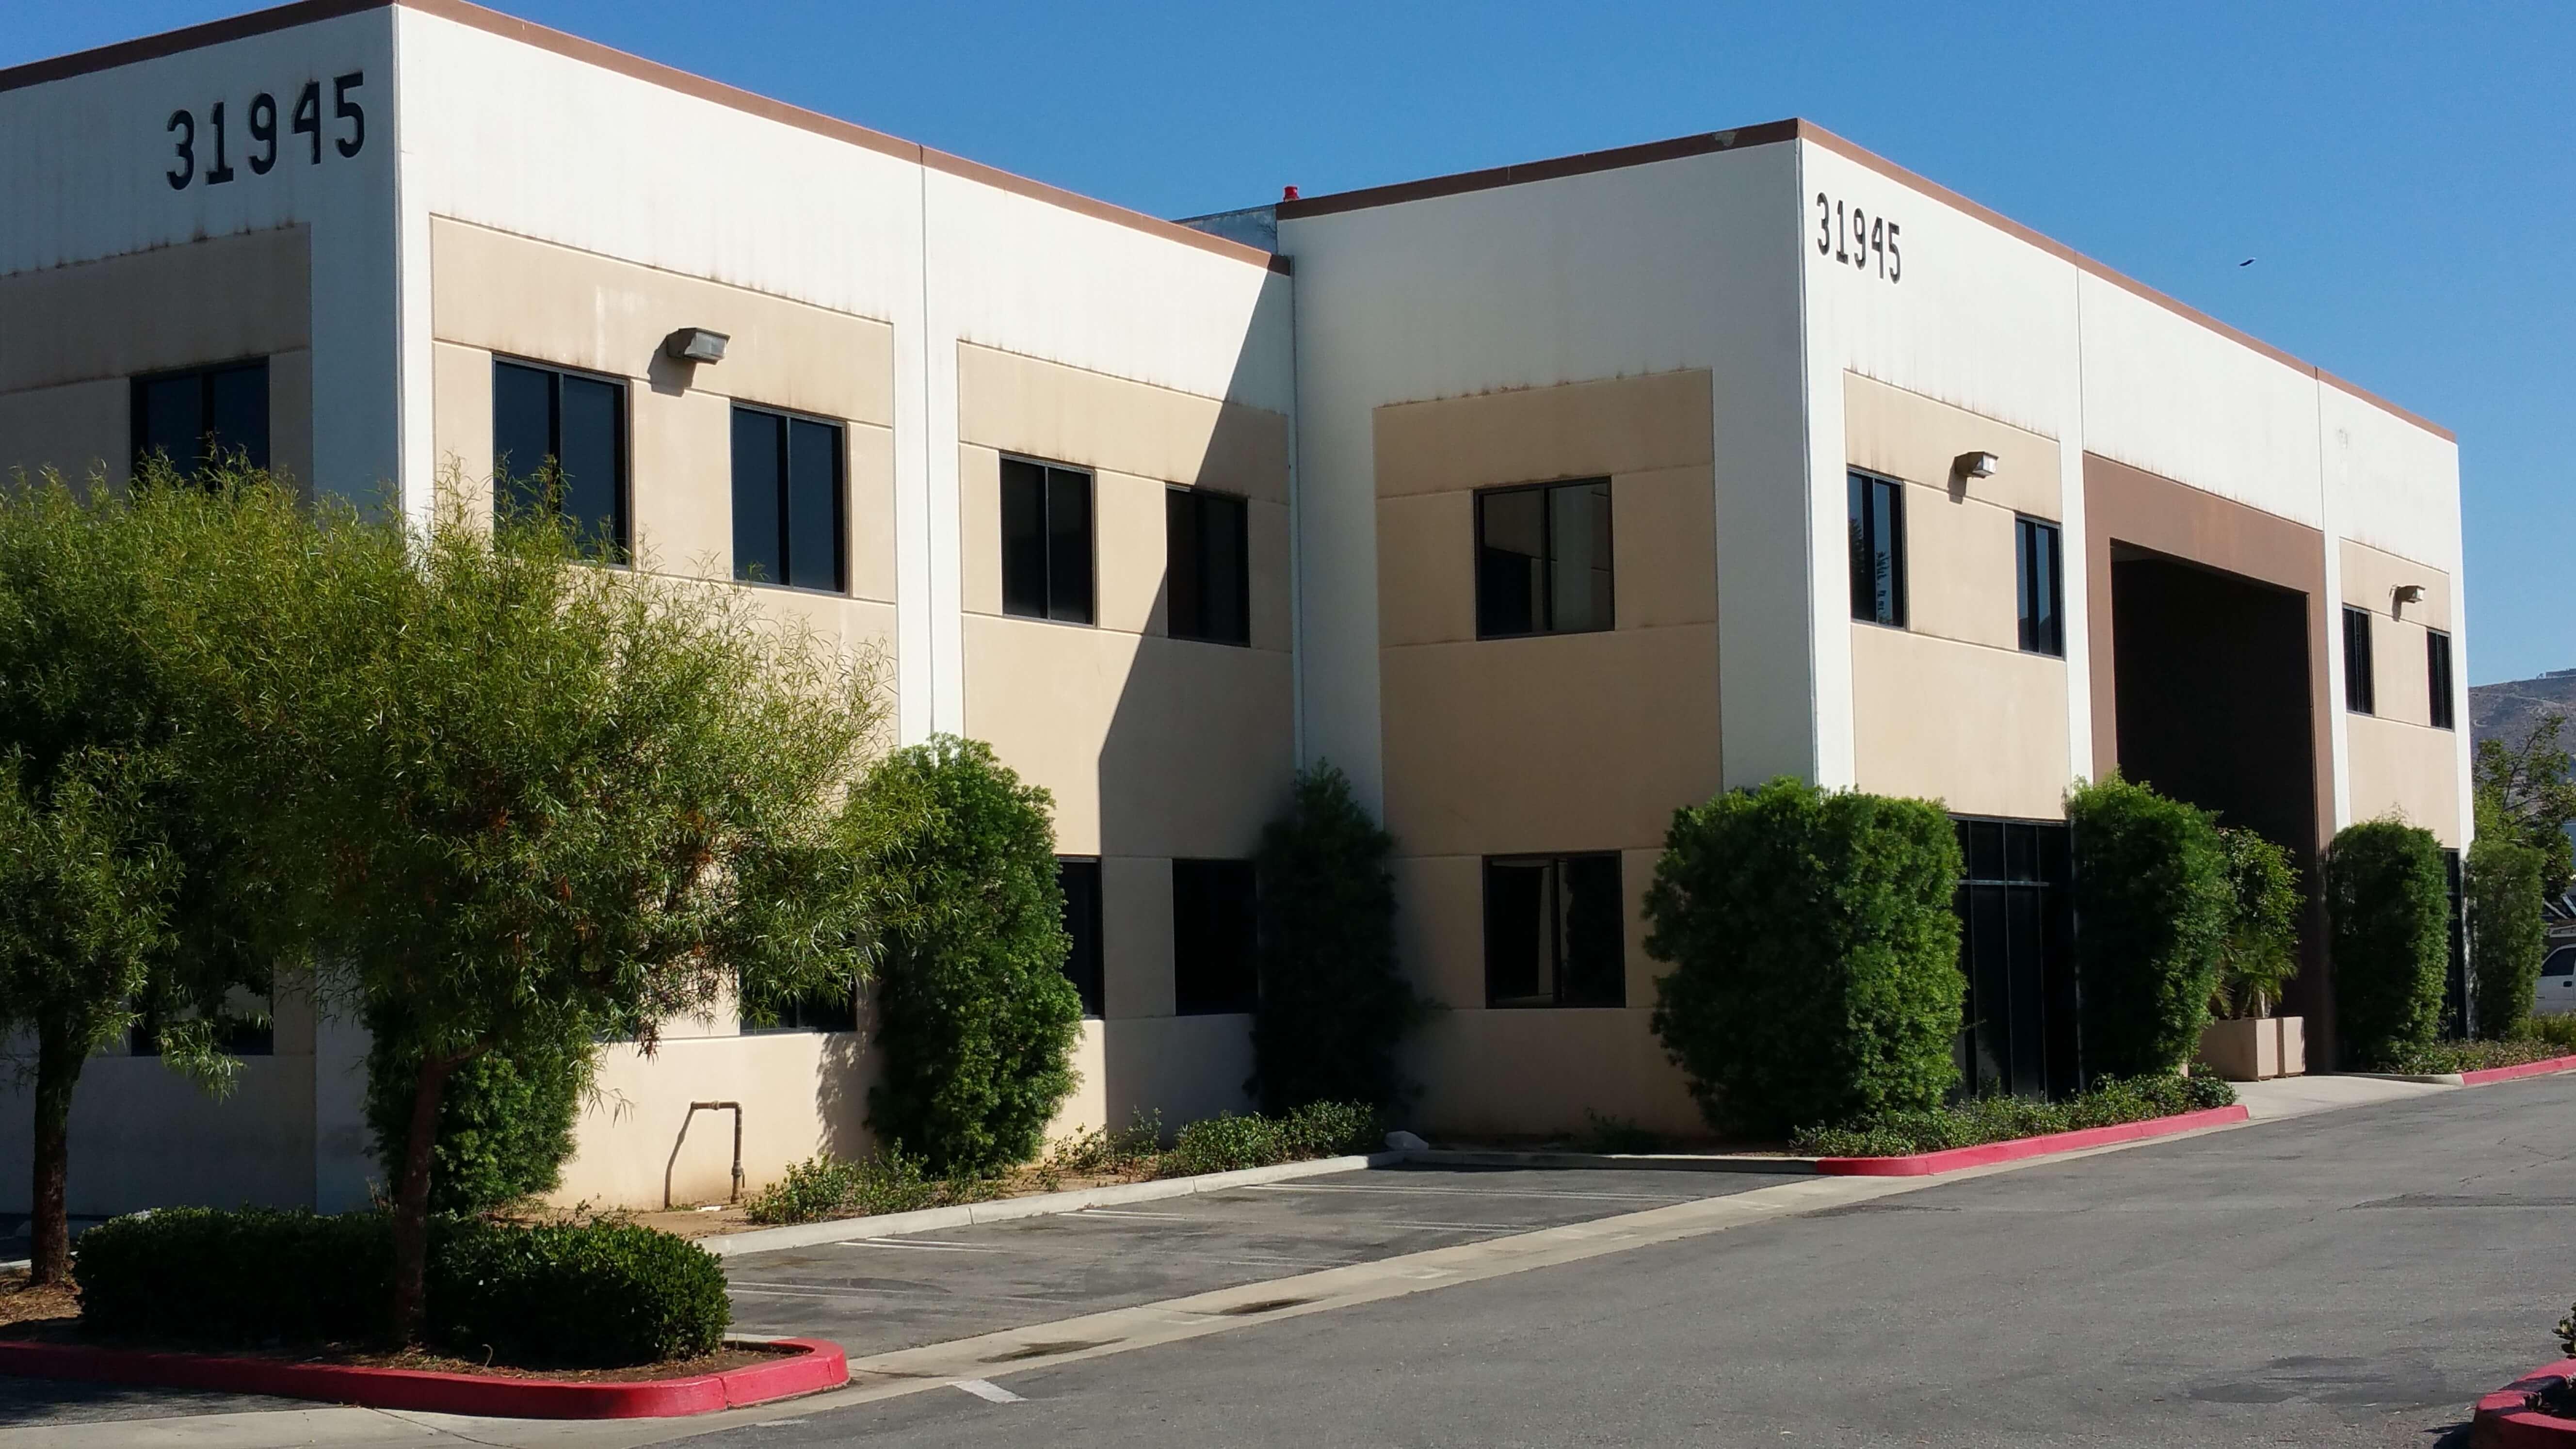 Hakes Sash and Door Corporate Office